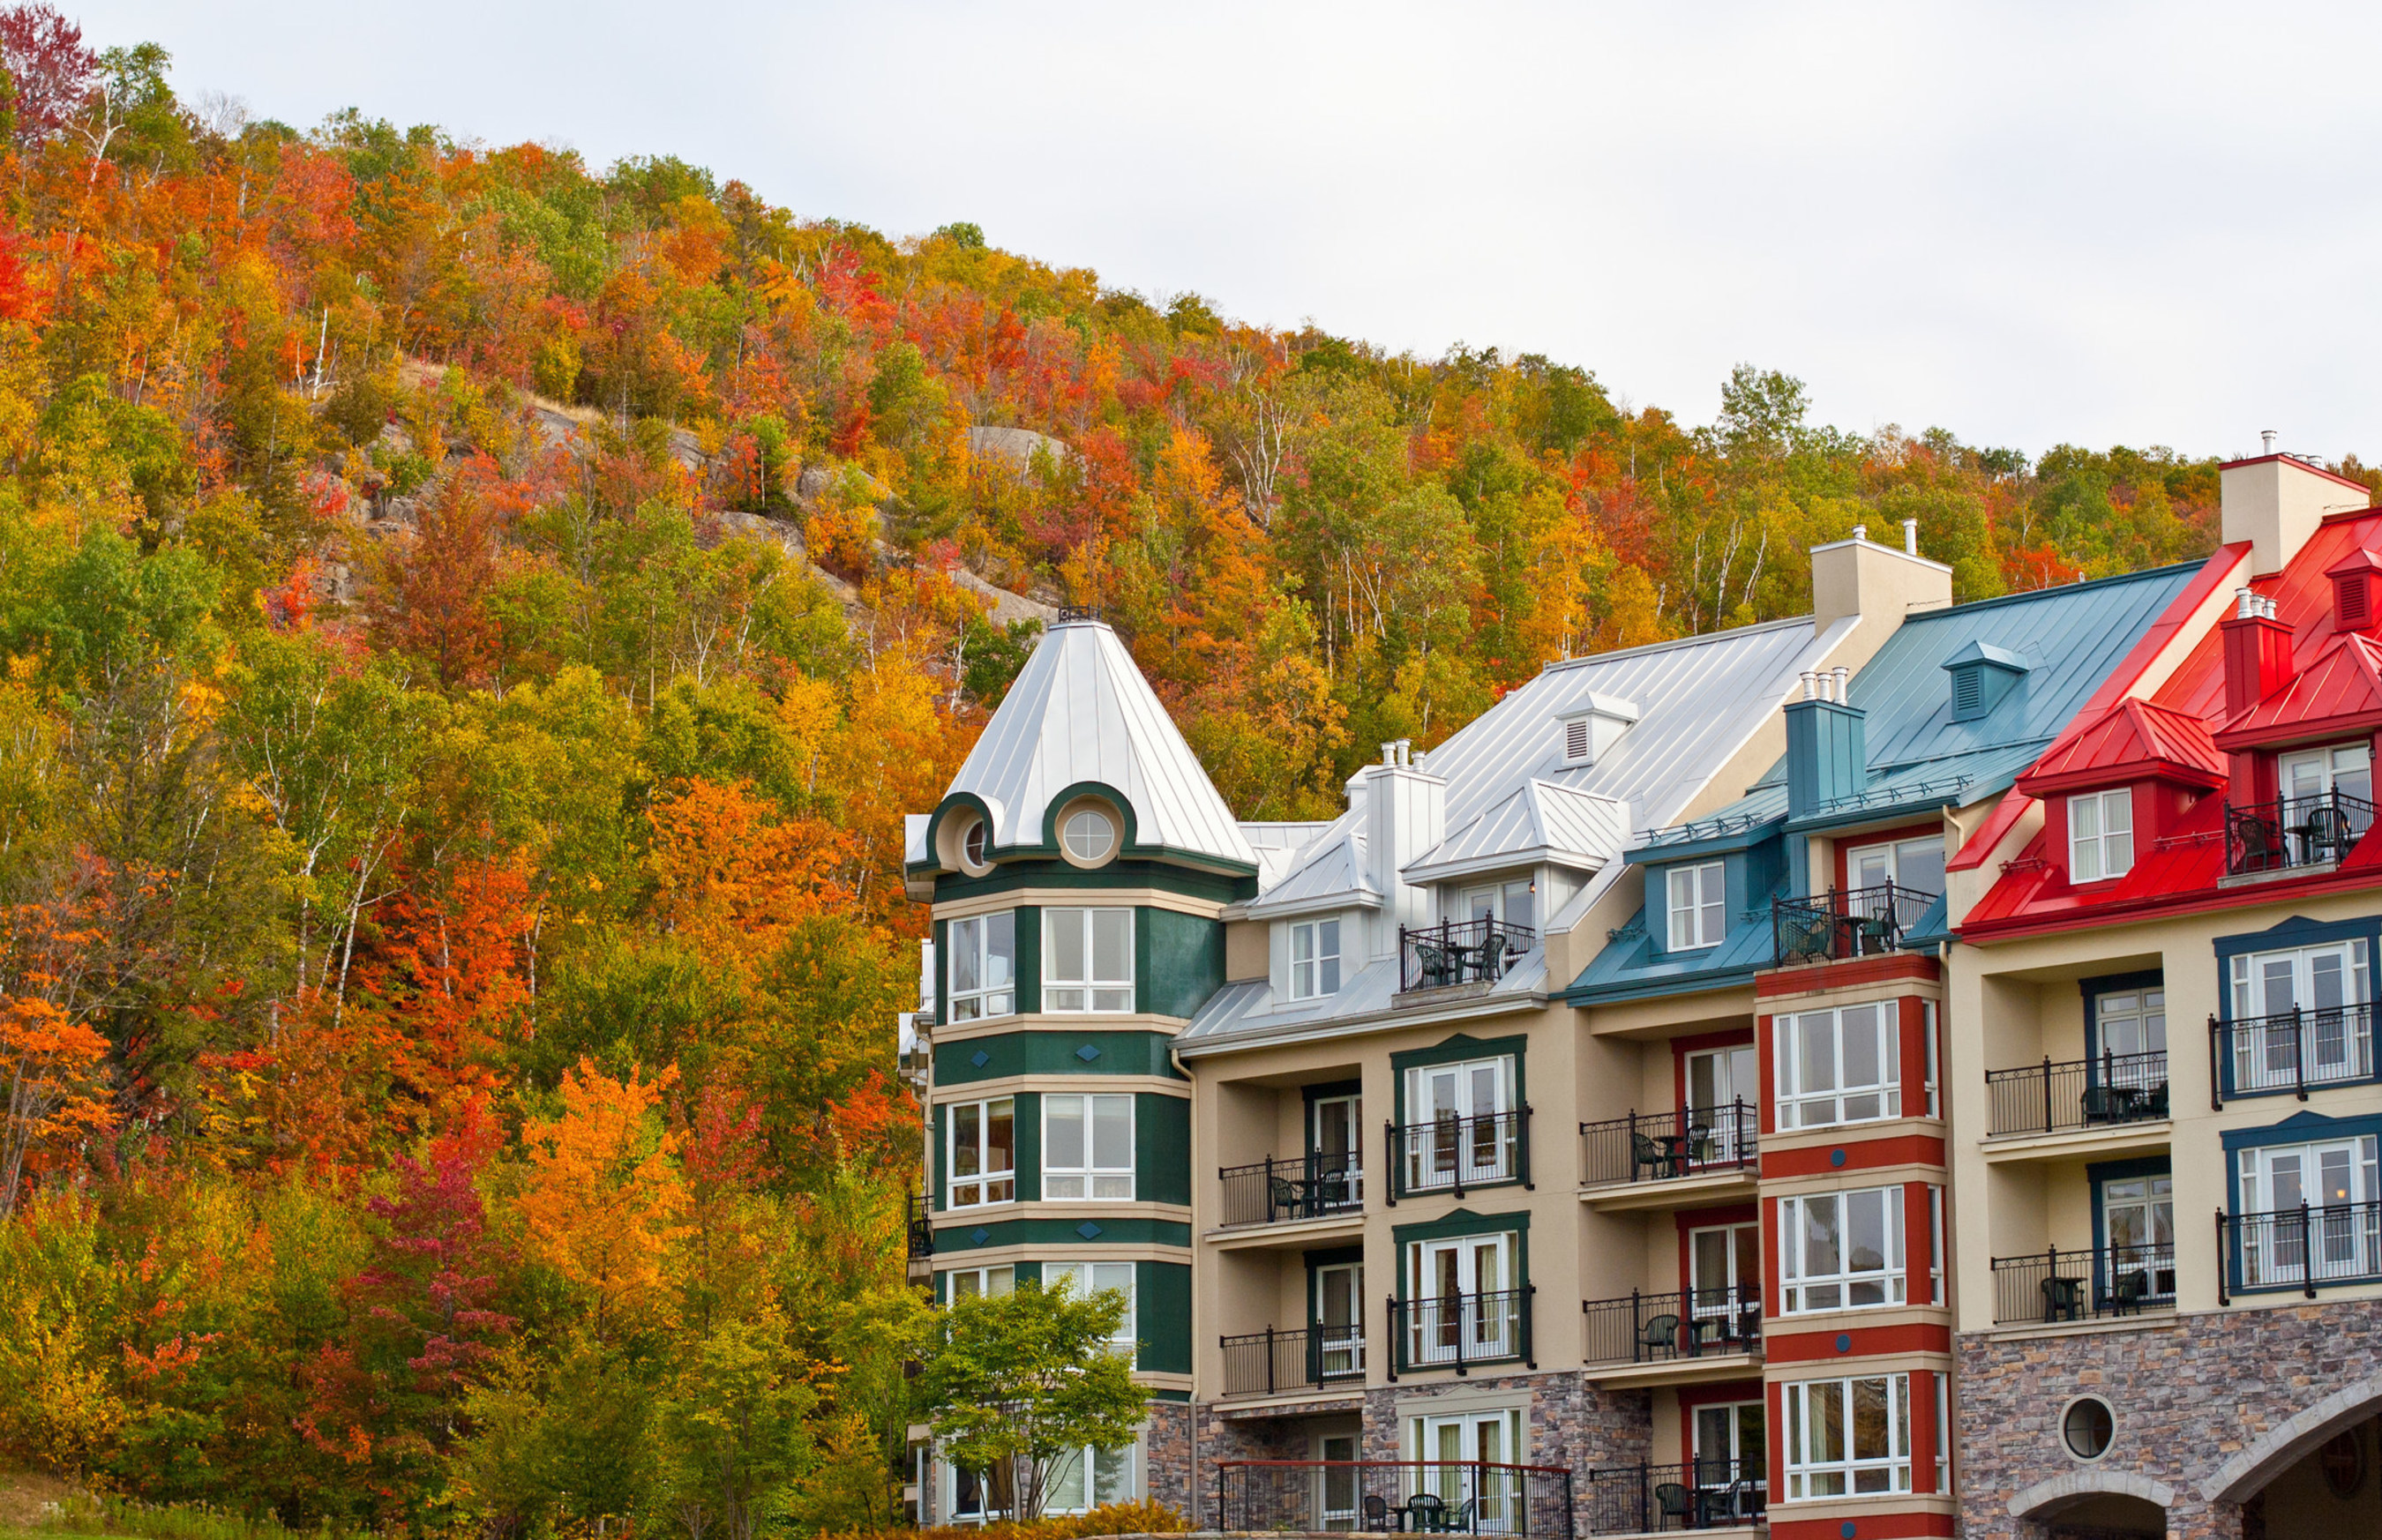 Mont Tremblant in Quebec, Canada